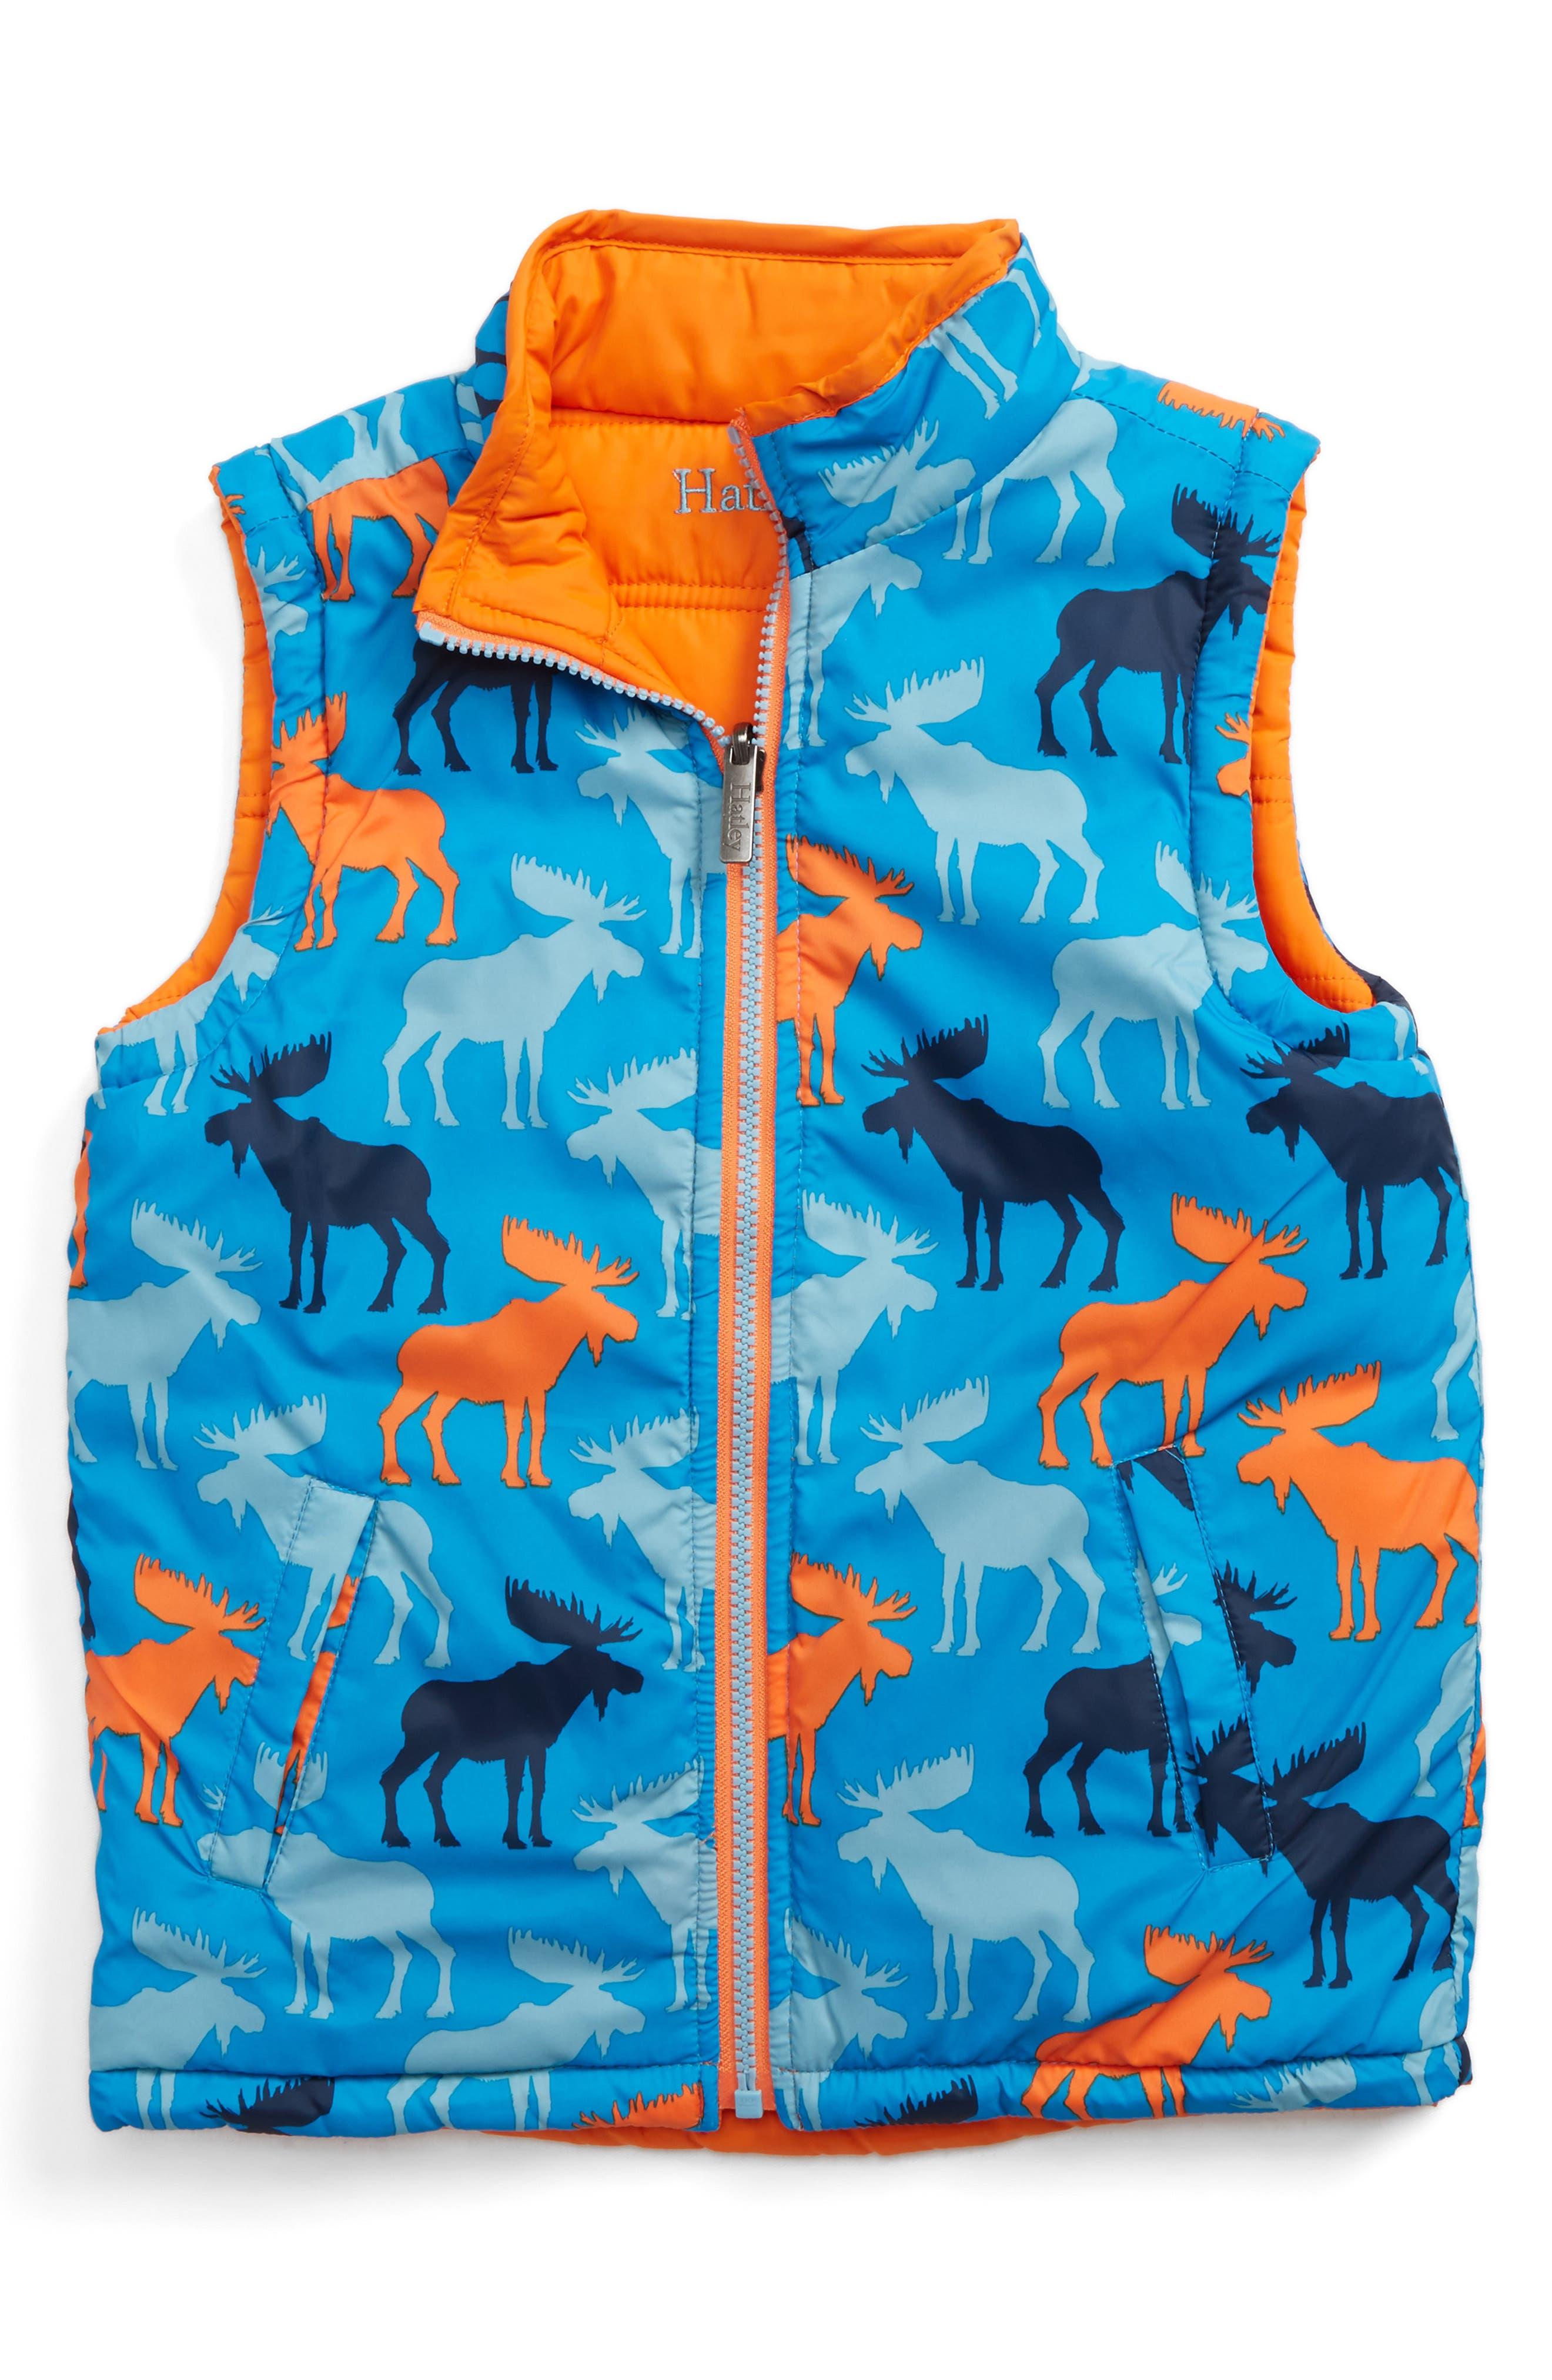 Main Image - Hatley Reversible Puffer Vest (Toddler Boys, Little Boys & Big Boys)